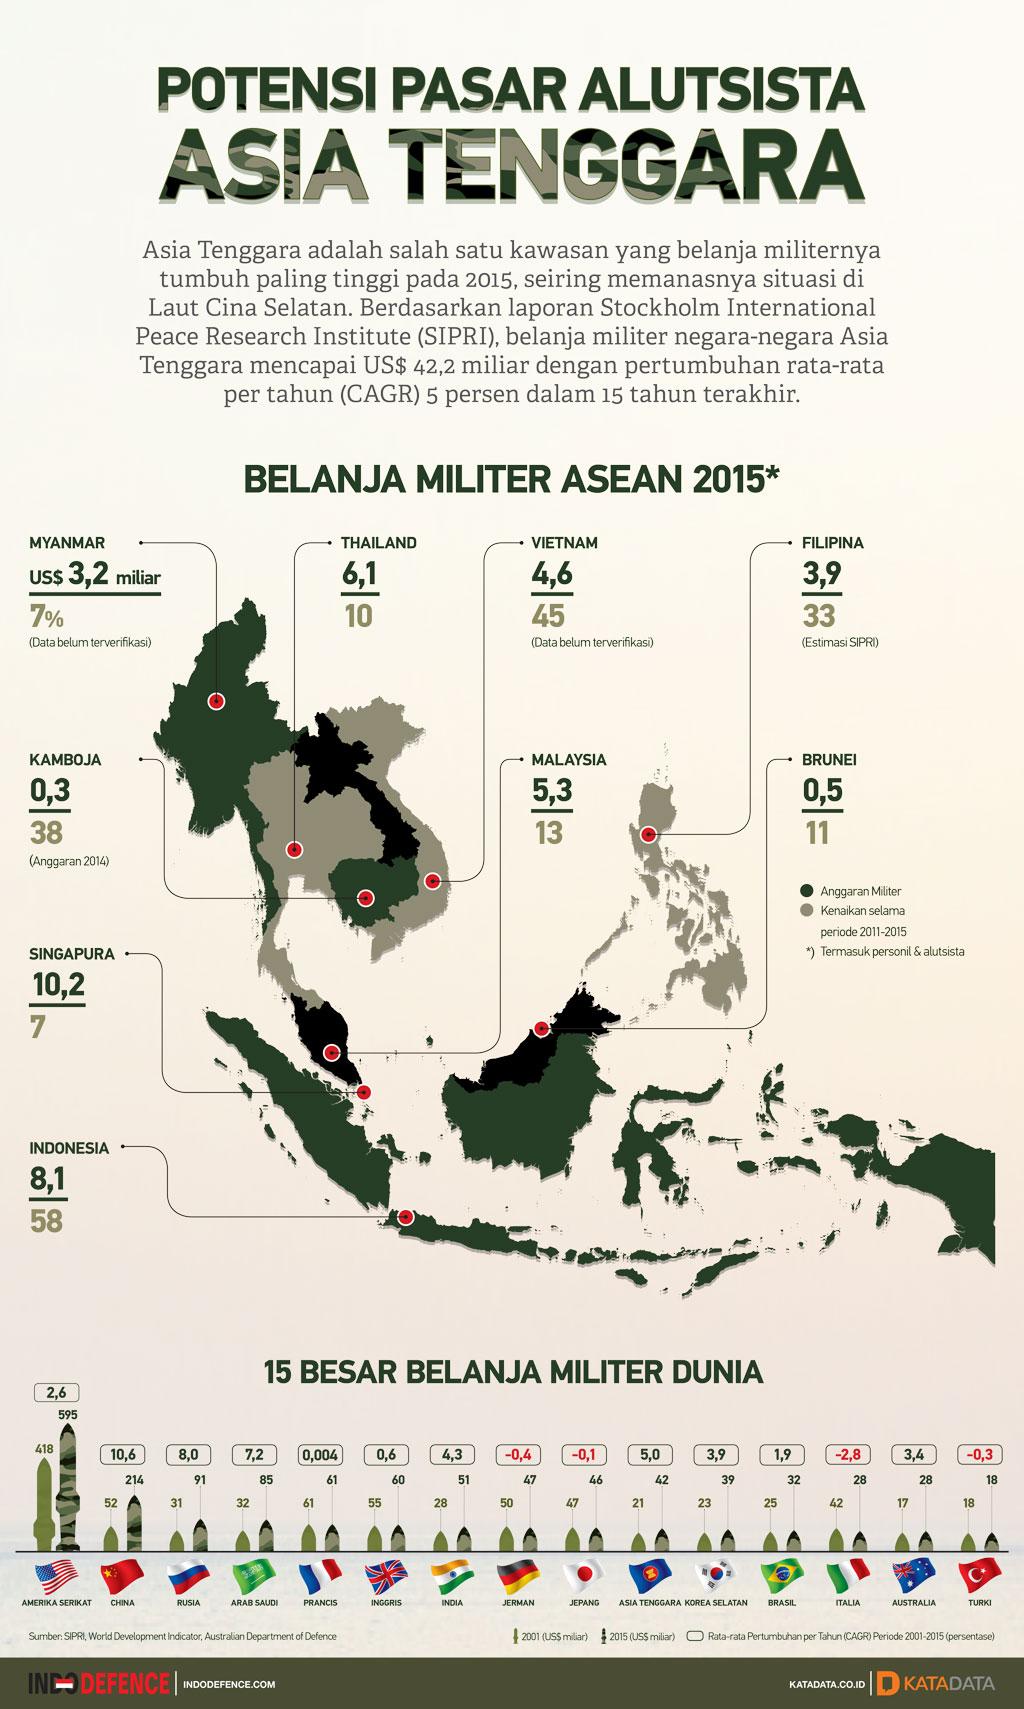 Potensi Pasar Alutsista Asia Tenggara